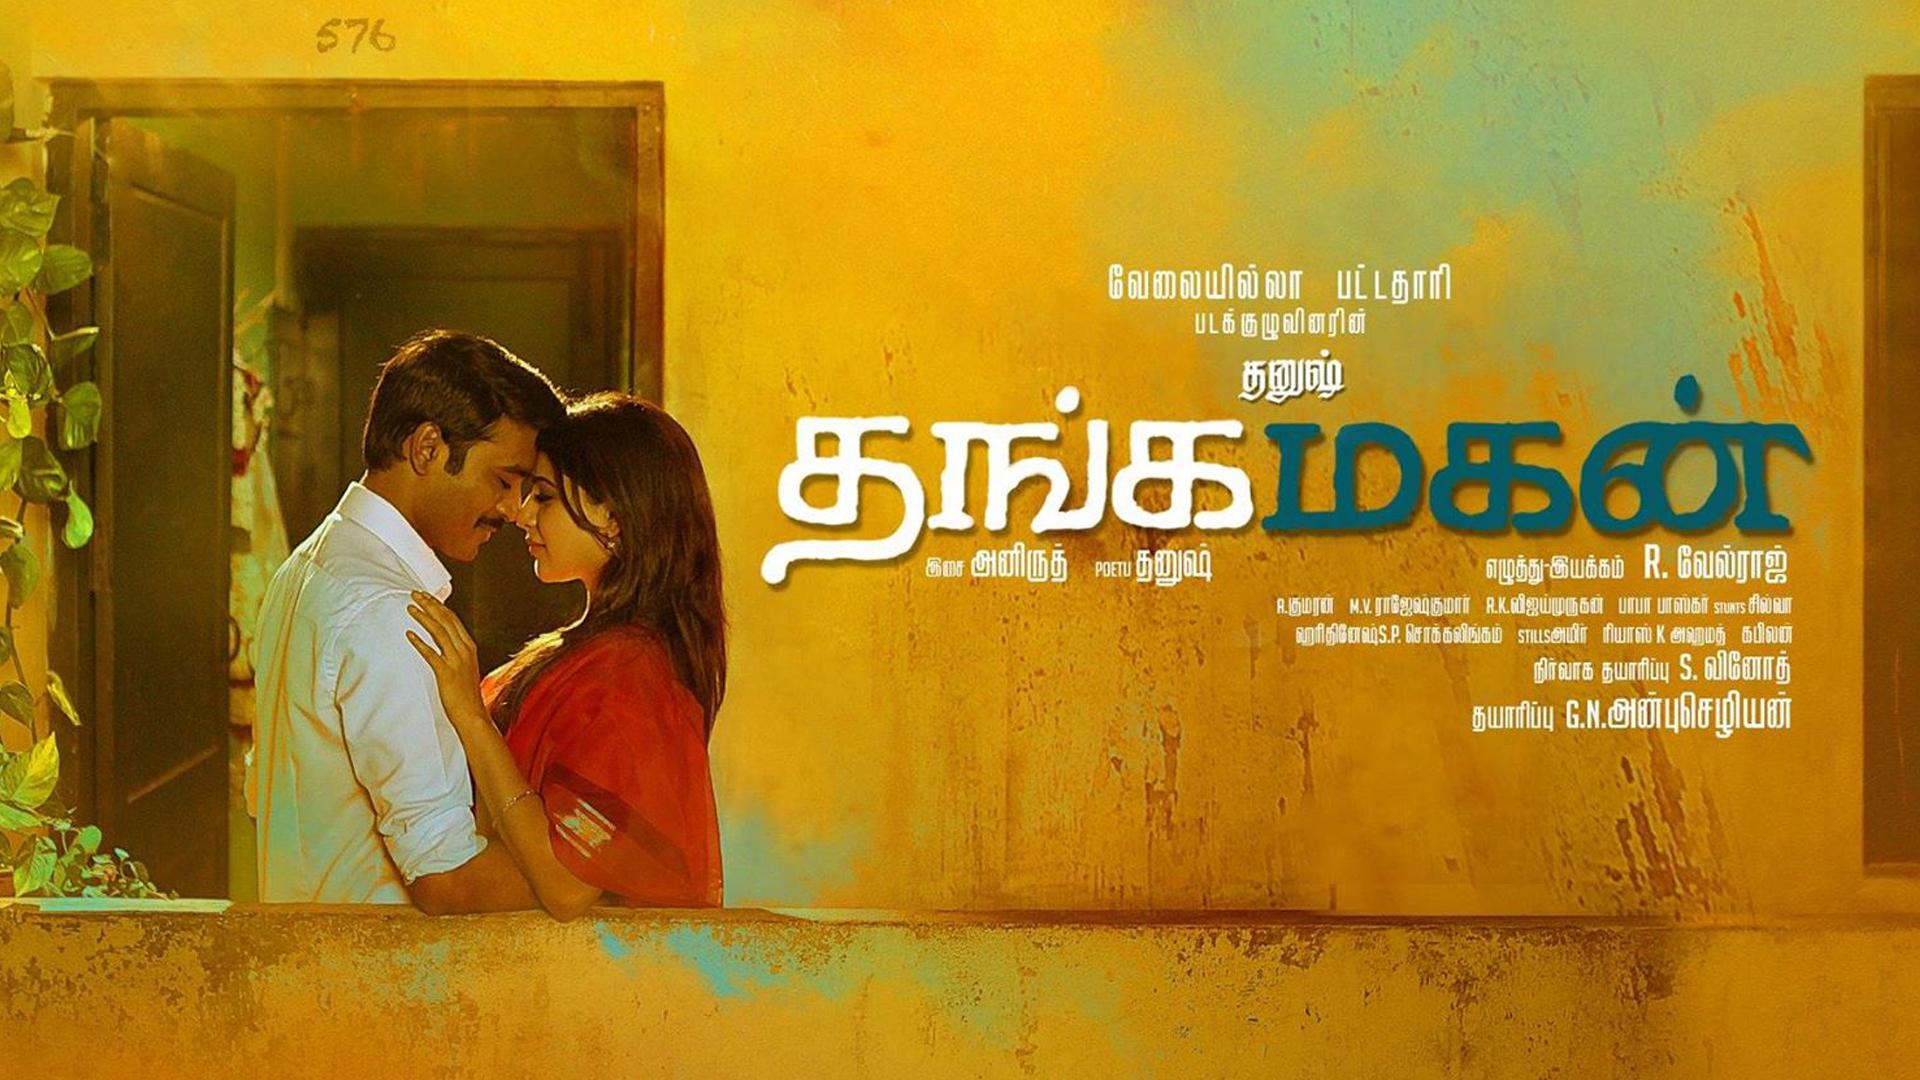 Watch 'Thangamagan' Movie Trailer (Tamil) Starring Dhanush, Amy Jackson And Samantha Ruth Prabhu